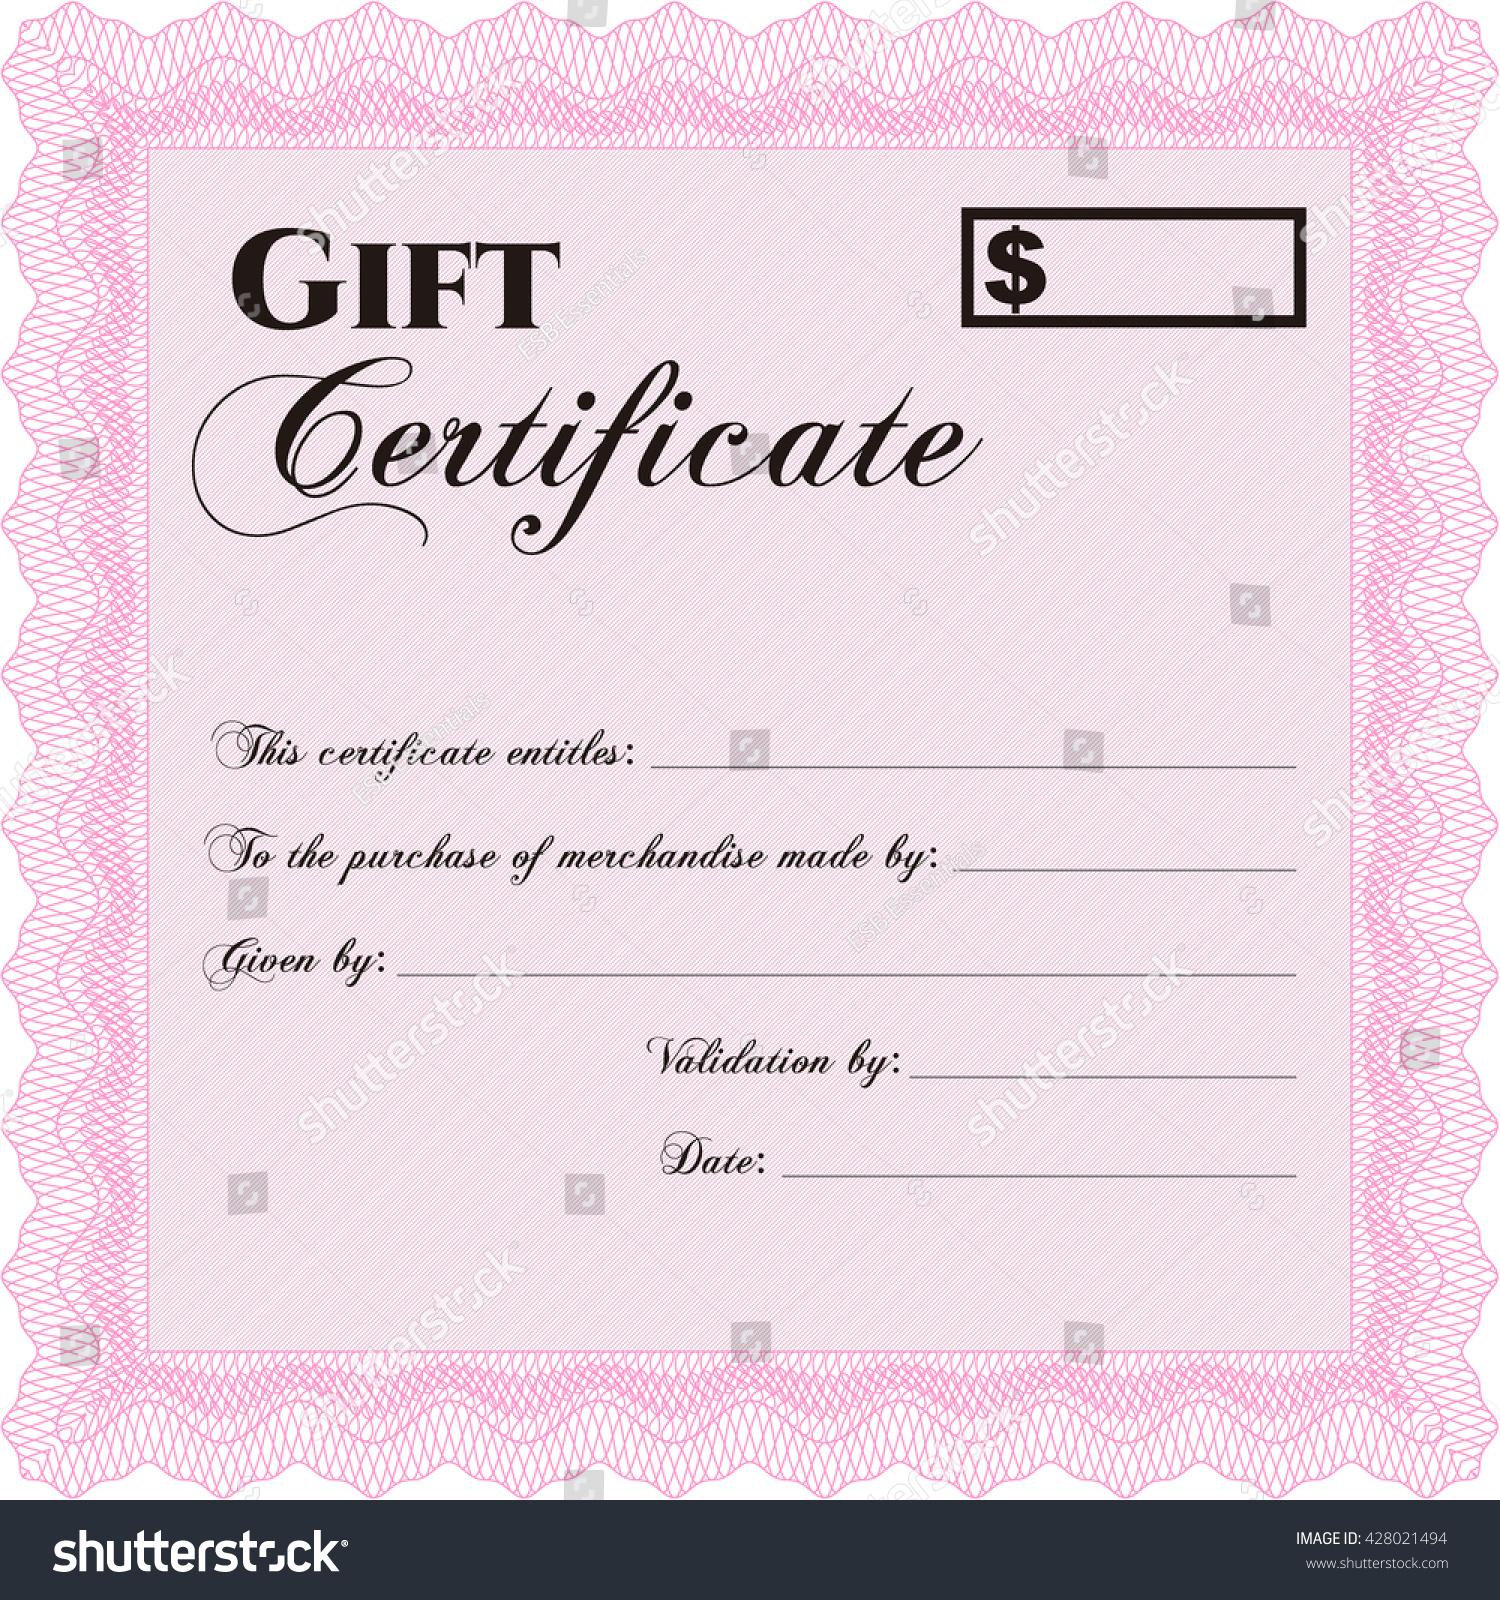 Formal Gift Certificate Template Elegant Design Stock Vector